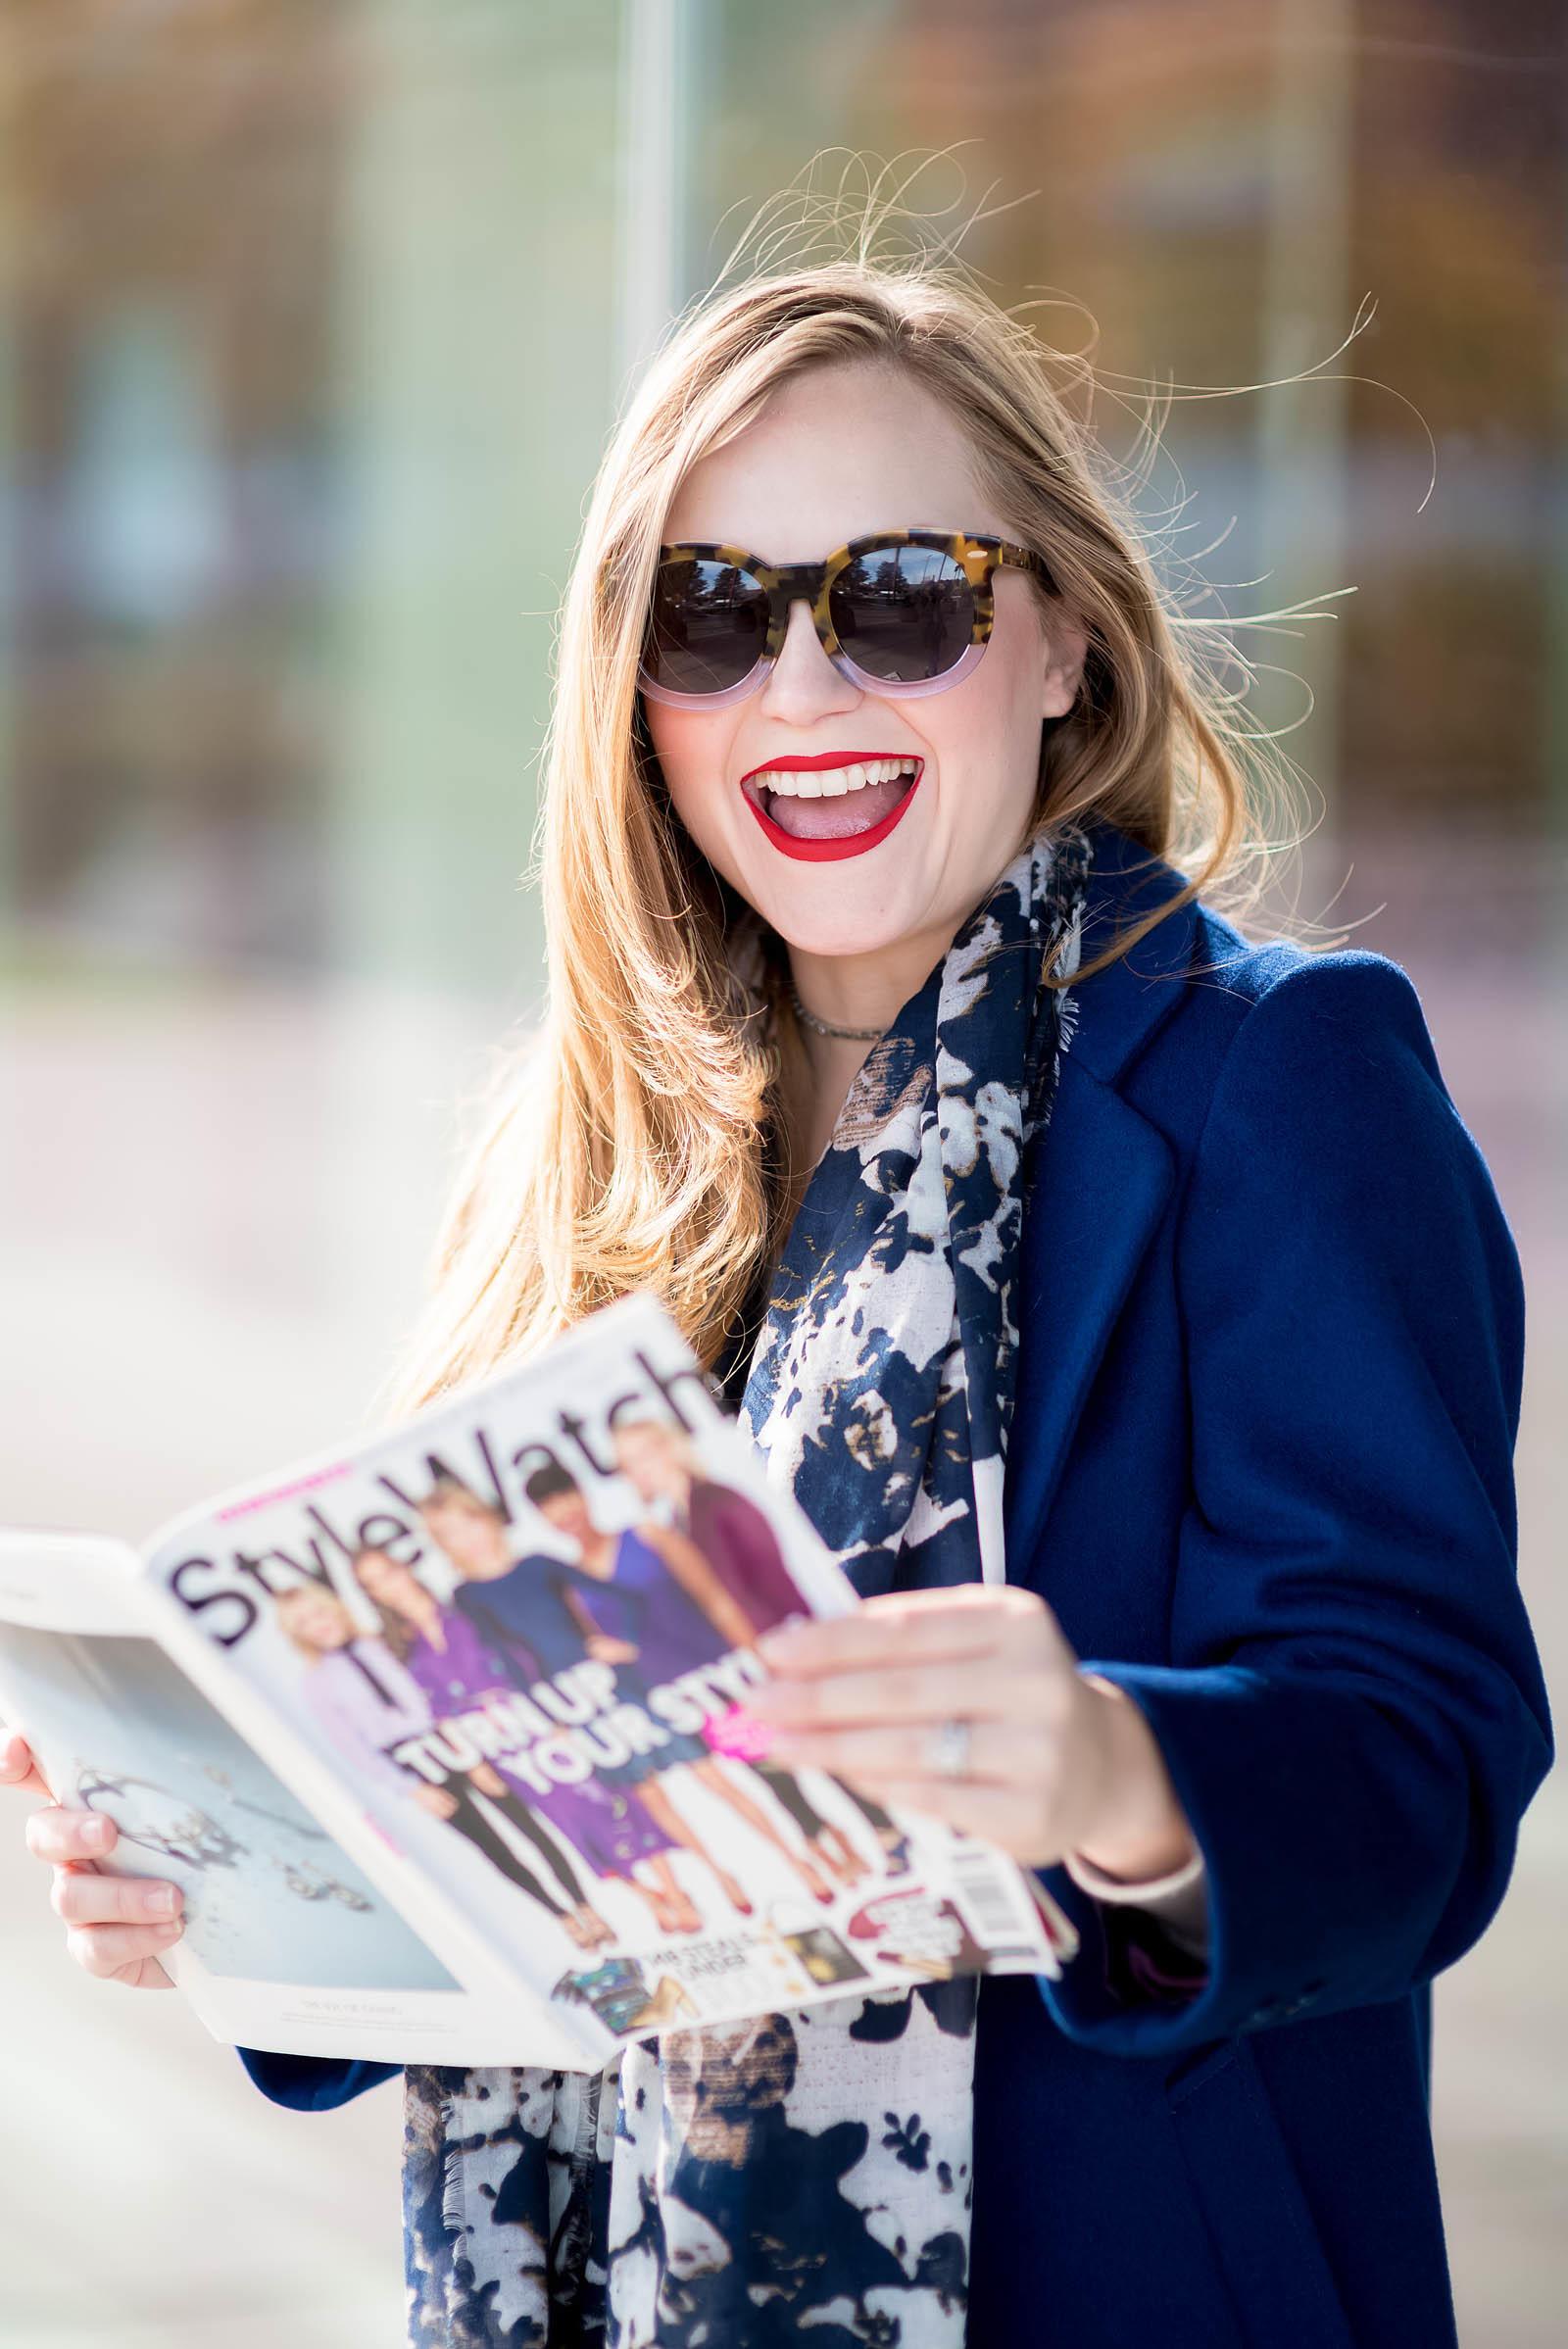 Style Watch Magazine November 2016 Blogger